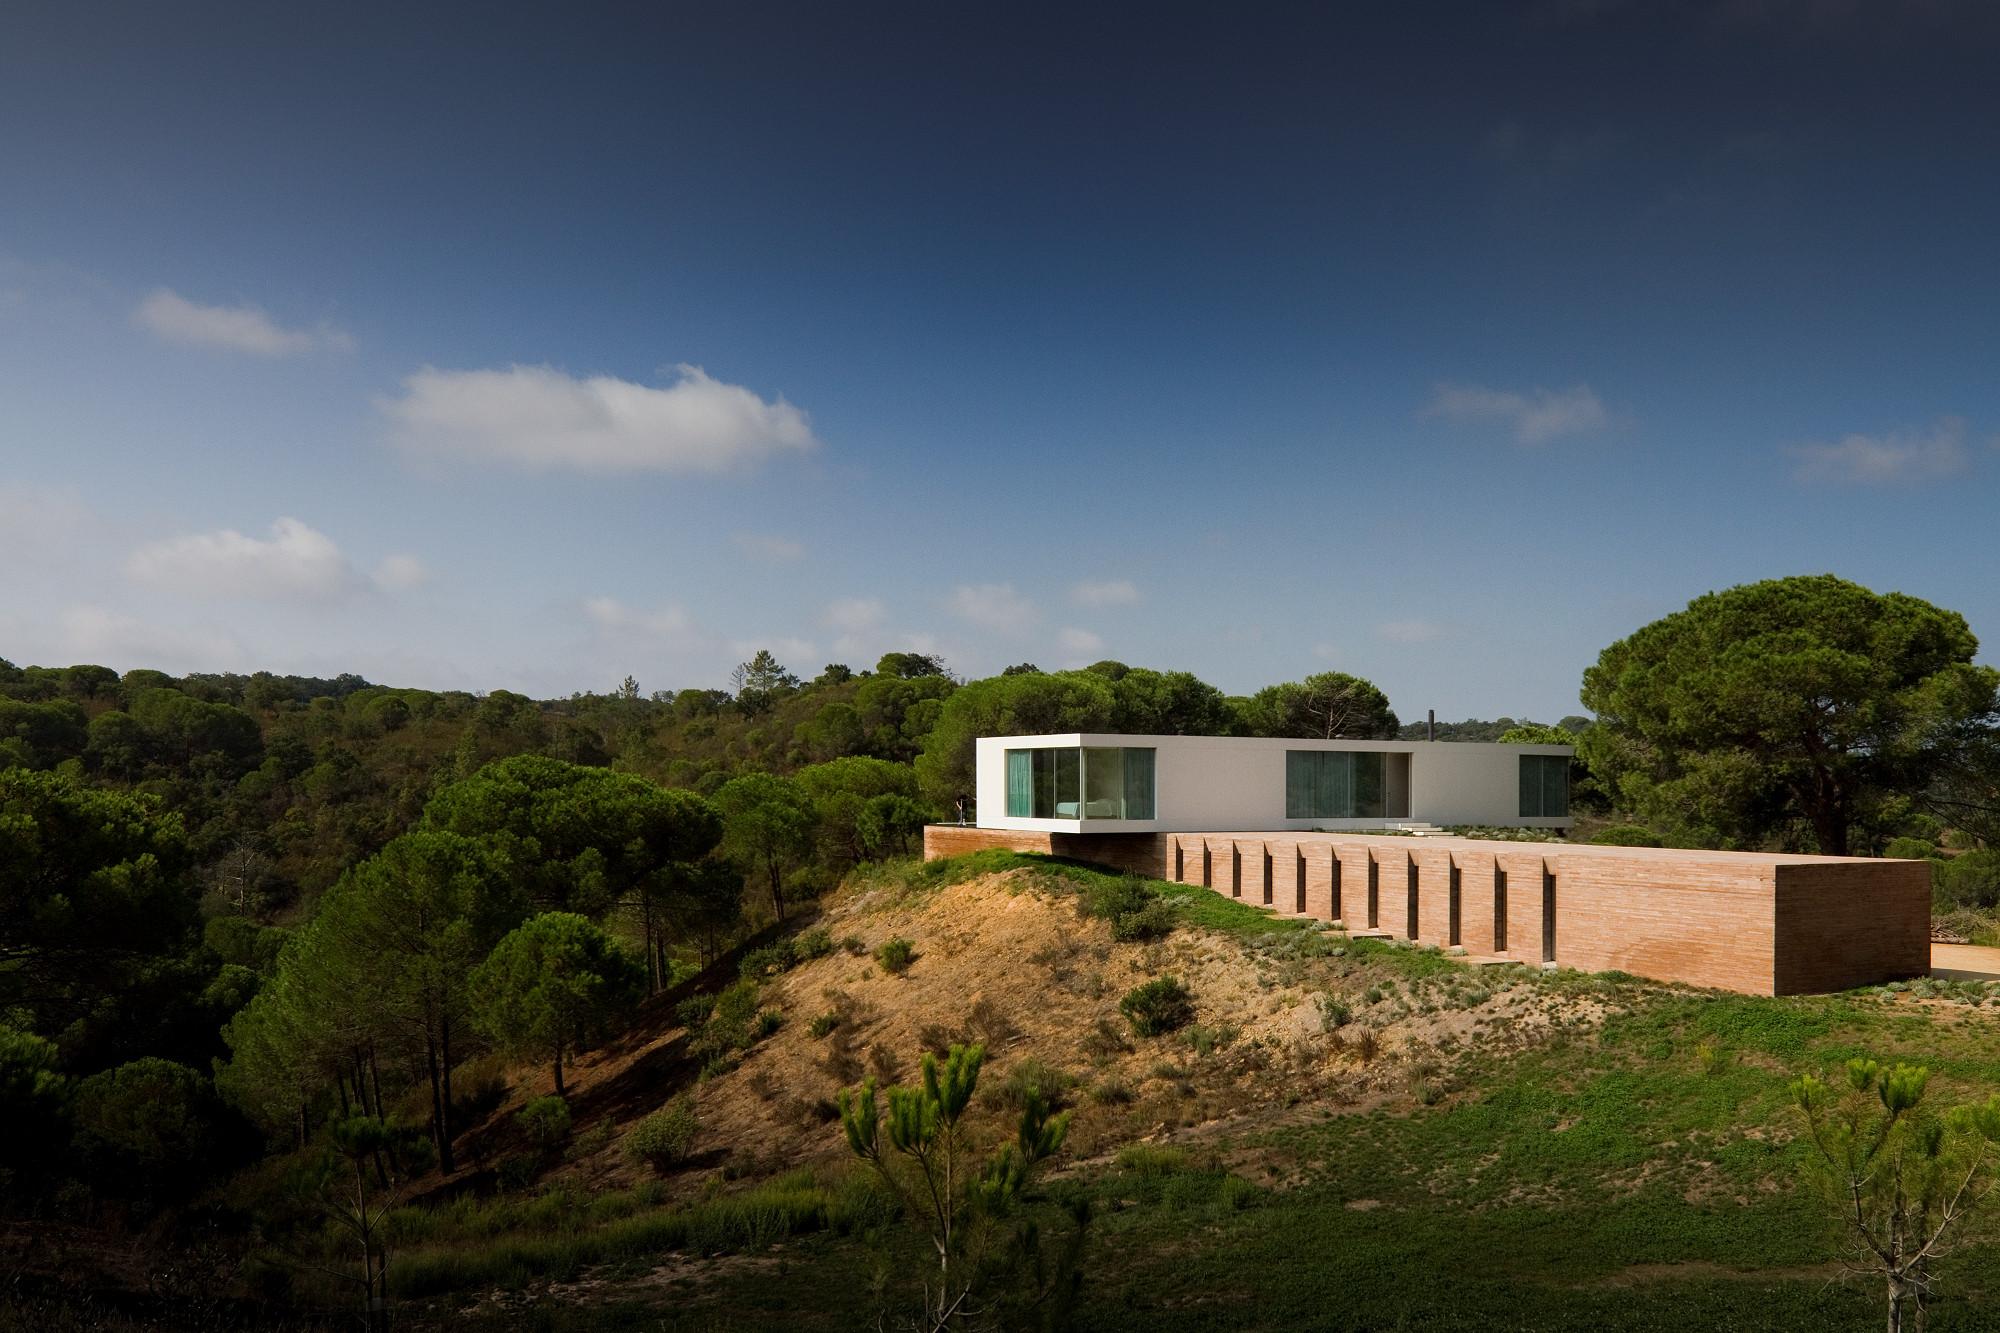 Casa en Melides / Pedro Reis, © FG + SG